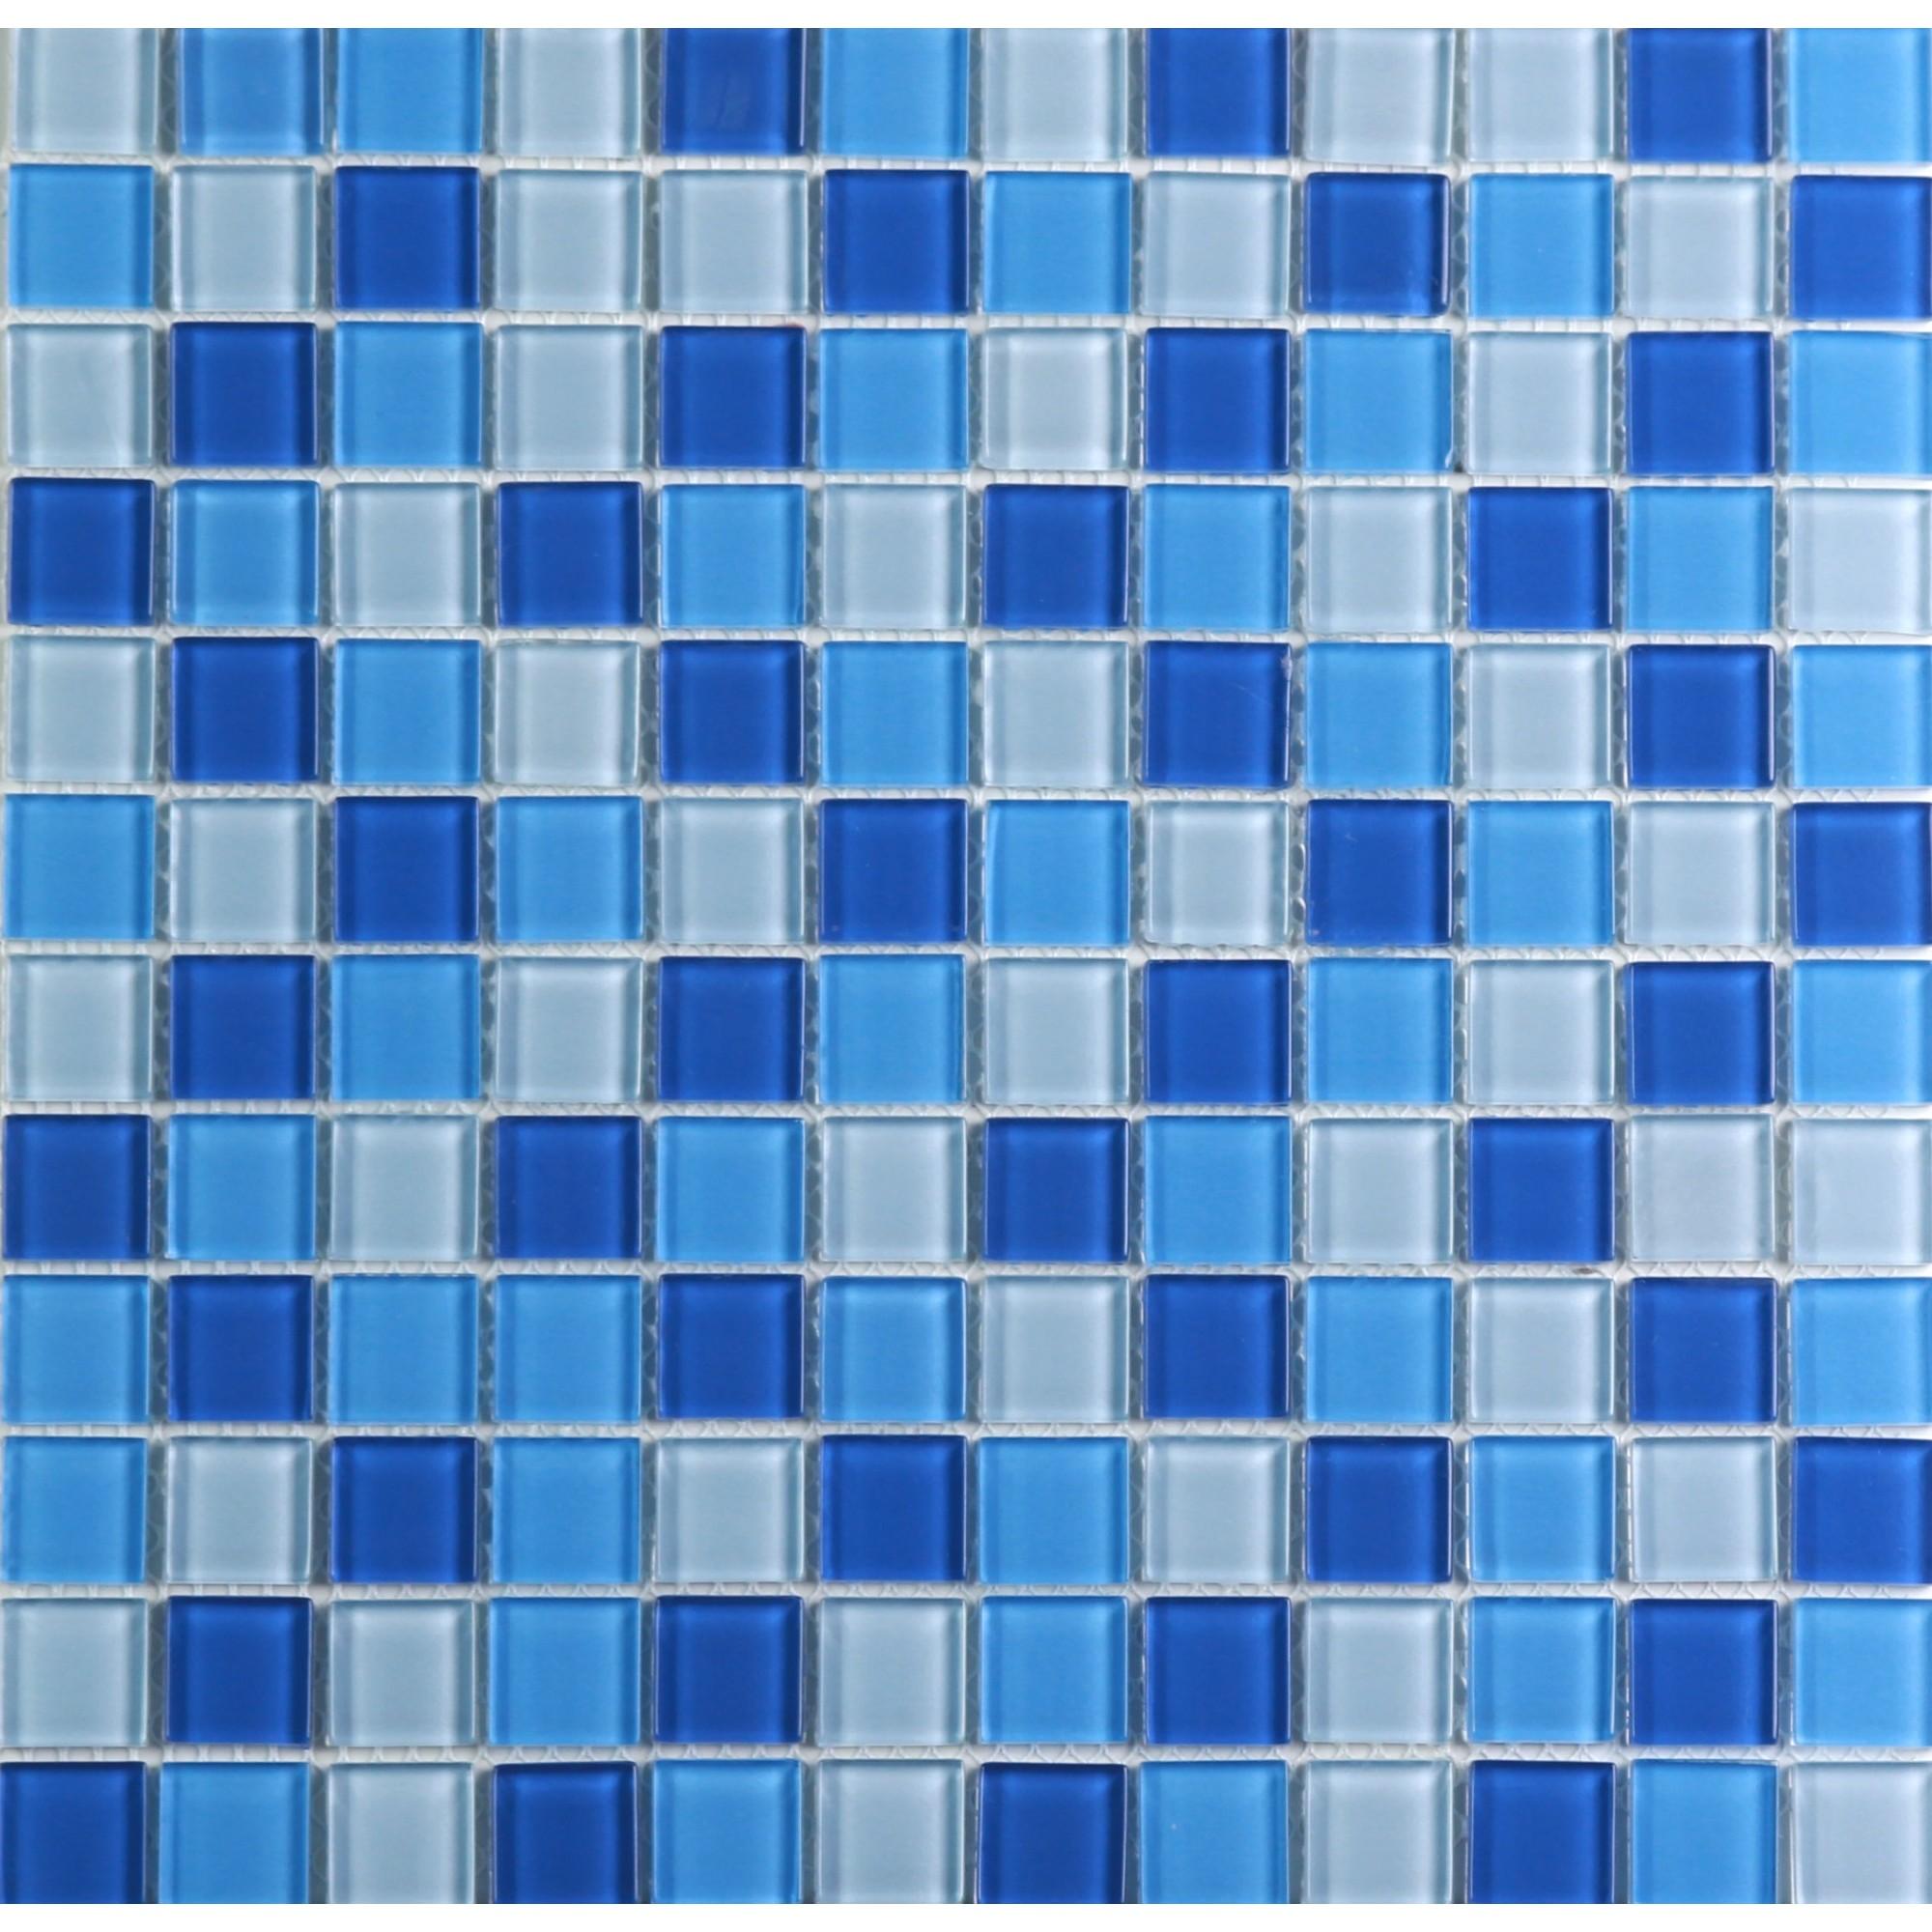 Pastilha de Vidro Brilhante 23x23cm Azul - VT0320C4115 - Vetromani